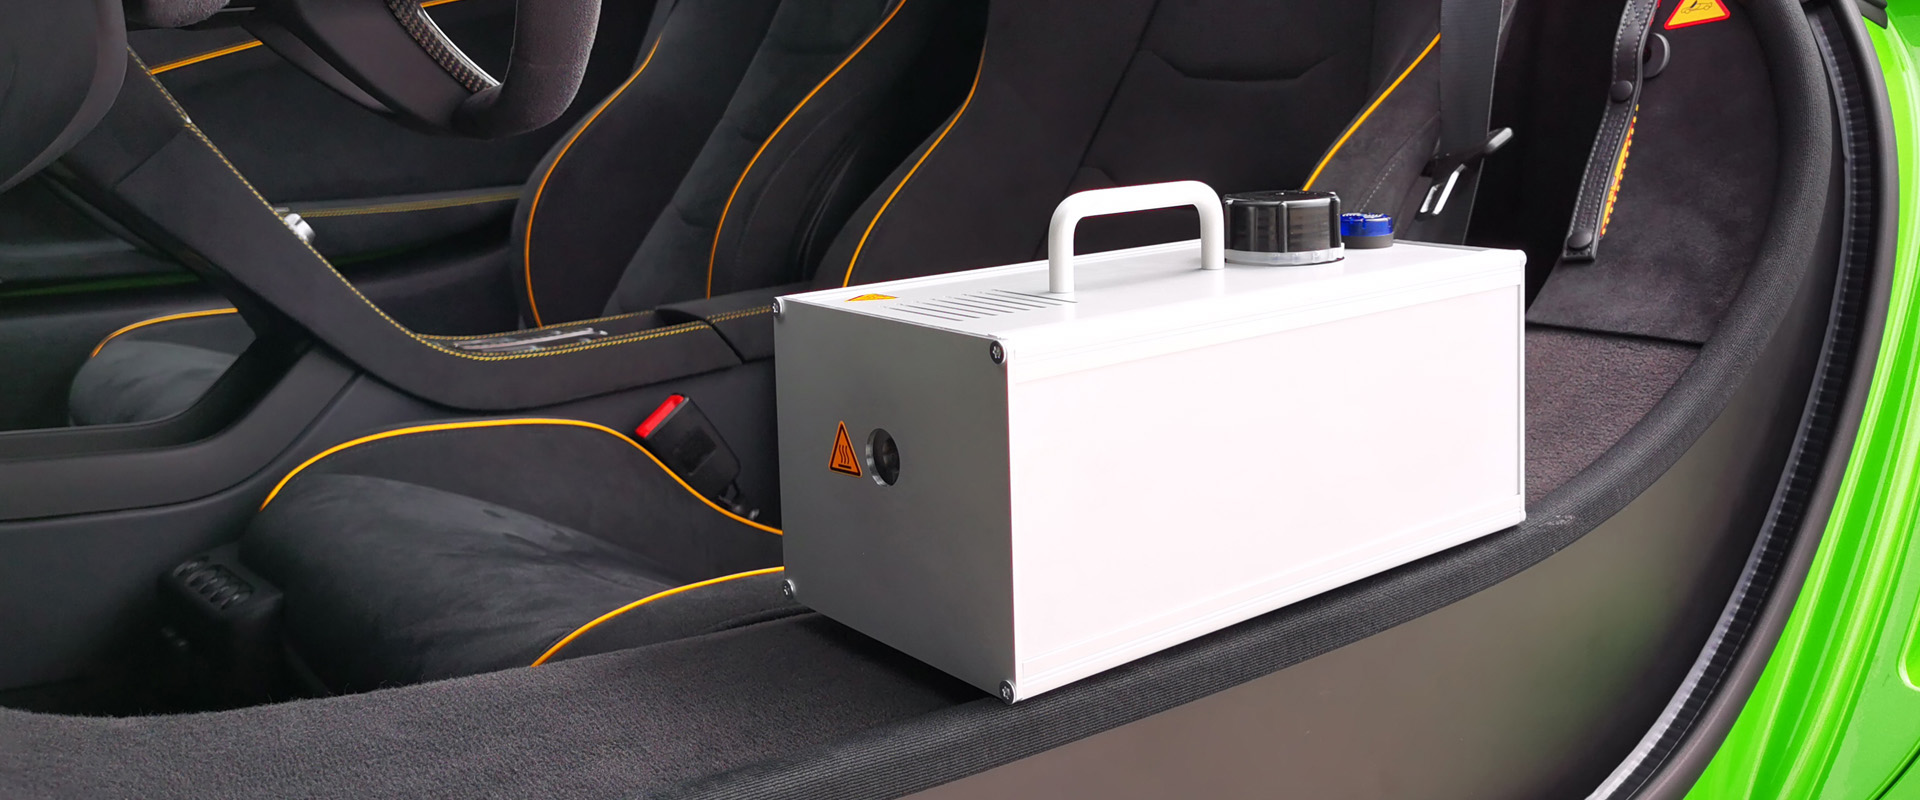 Full Size of Geruch Auto Neutralisieren Ozon Geruch Neutralisieren Auto Tabak Geruch Neutralisieren Auto Zigaretten Geruch Neutralisieren Auto Küche Gerüche Neutralisieren Auto